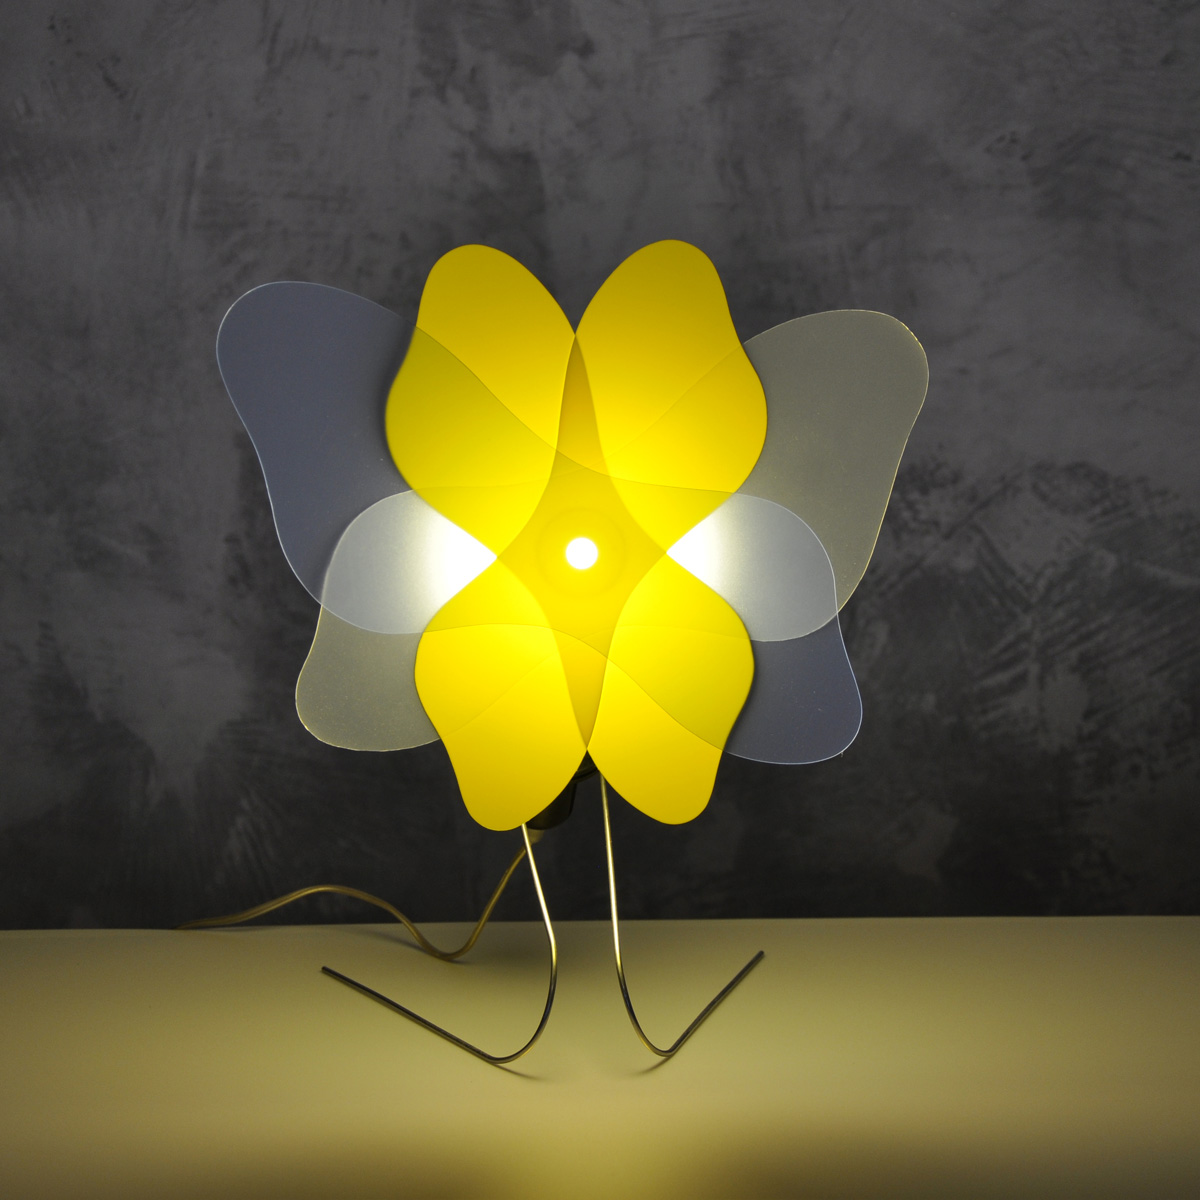 Freydenberg_Trans_Flower_Butterfly_7.jpg